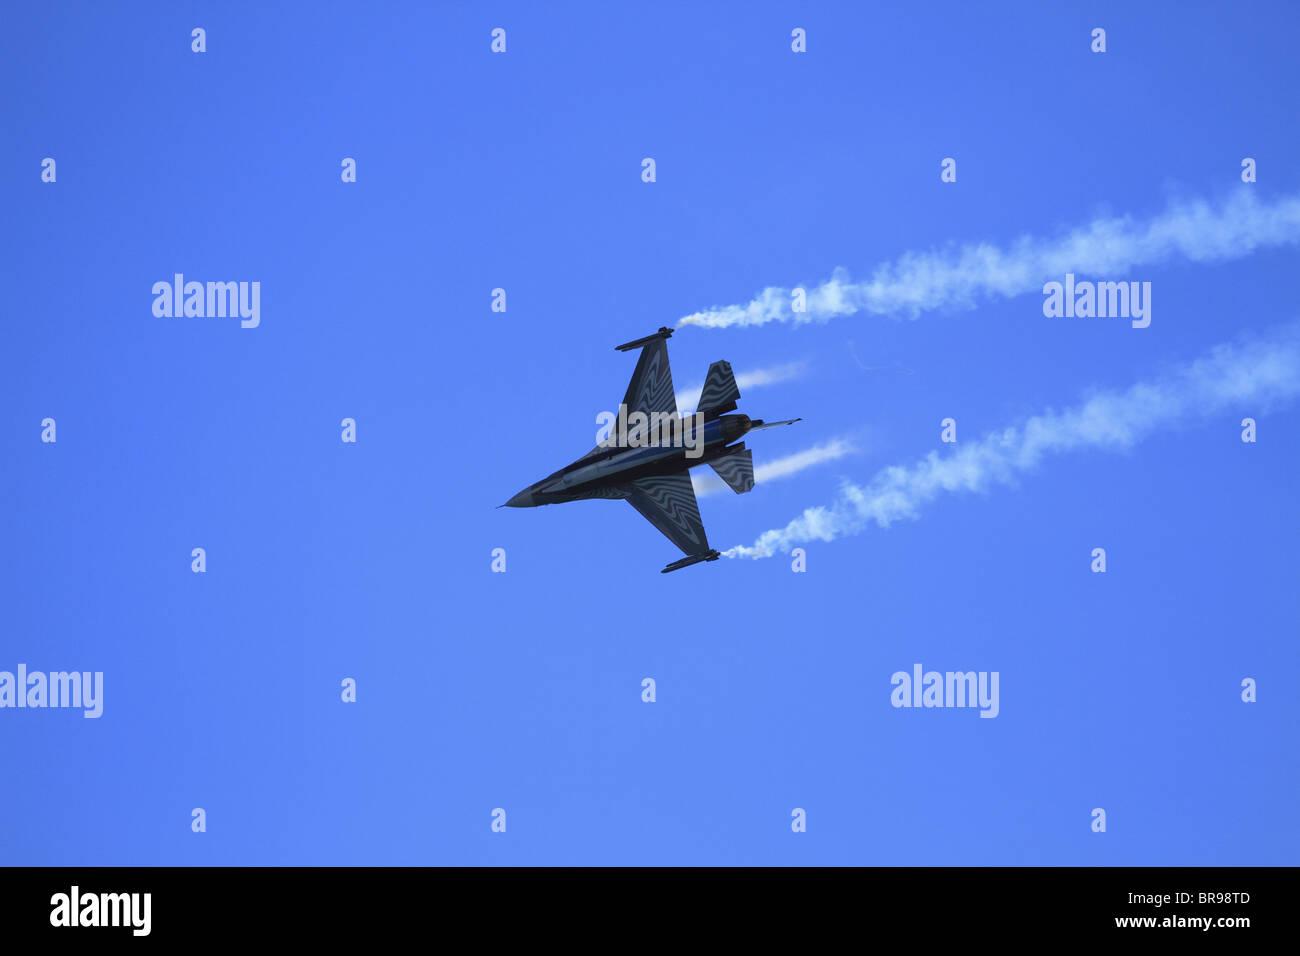 Una Fuerza Aérea Belga F16 (Lockheed Martin F-16 Falcon Jet de combate combate) realiza en el show aéreo de Eastbourne, East Sussex, Inglaterra Foto de stock